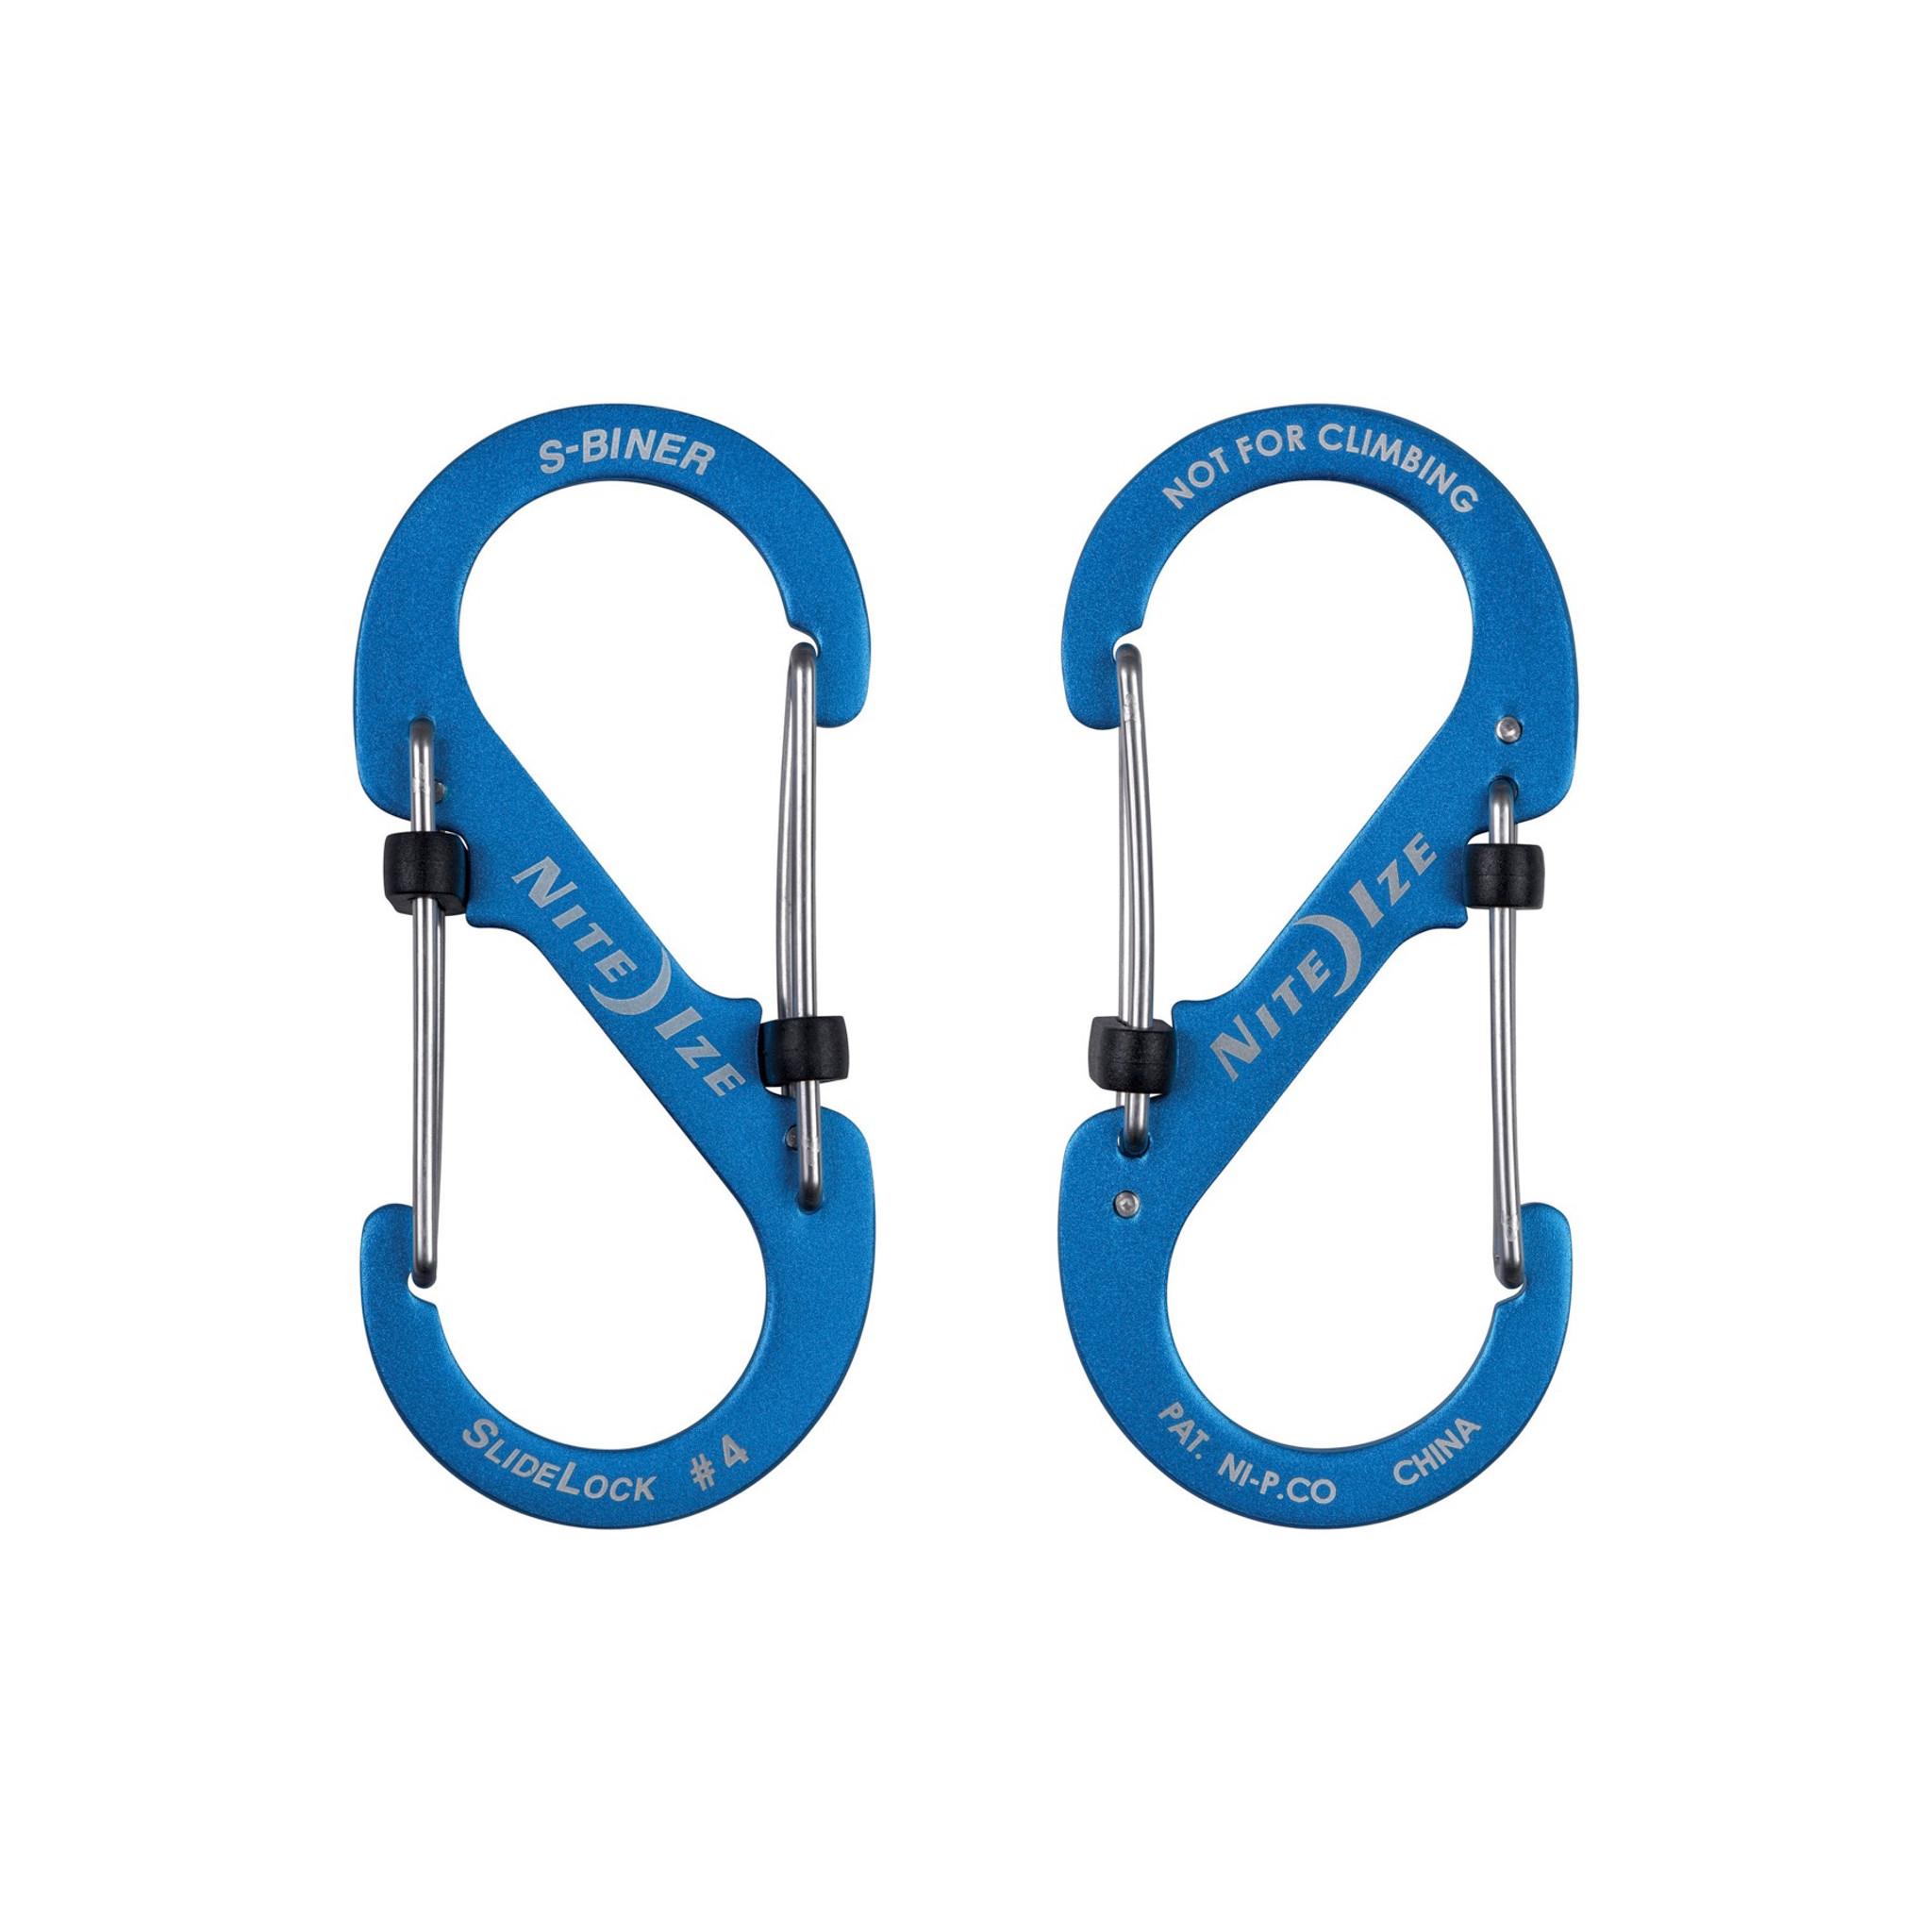 Nite Ize S-Biner Slidelock Aluminum #4 Blue - Jay's Outdoor Supply